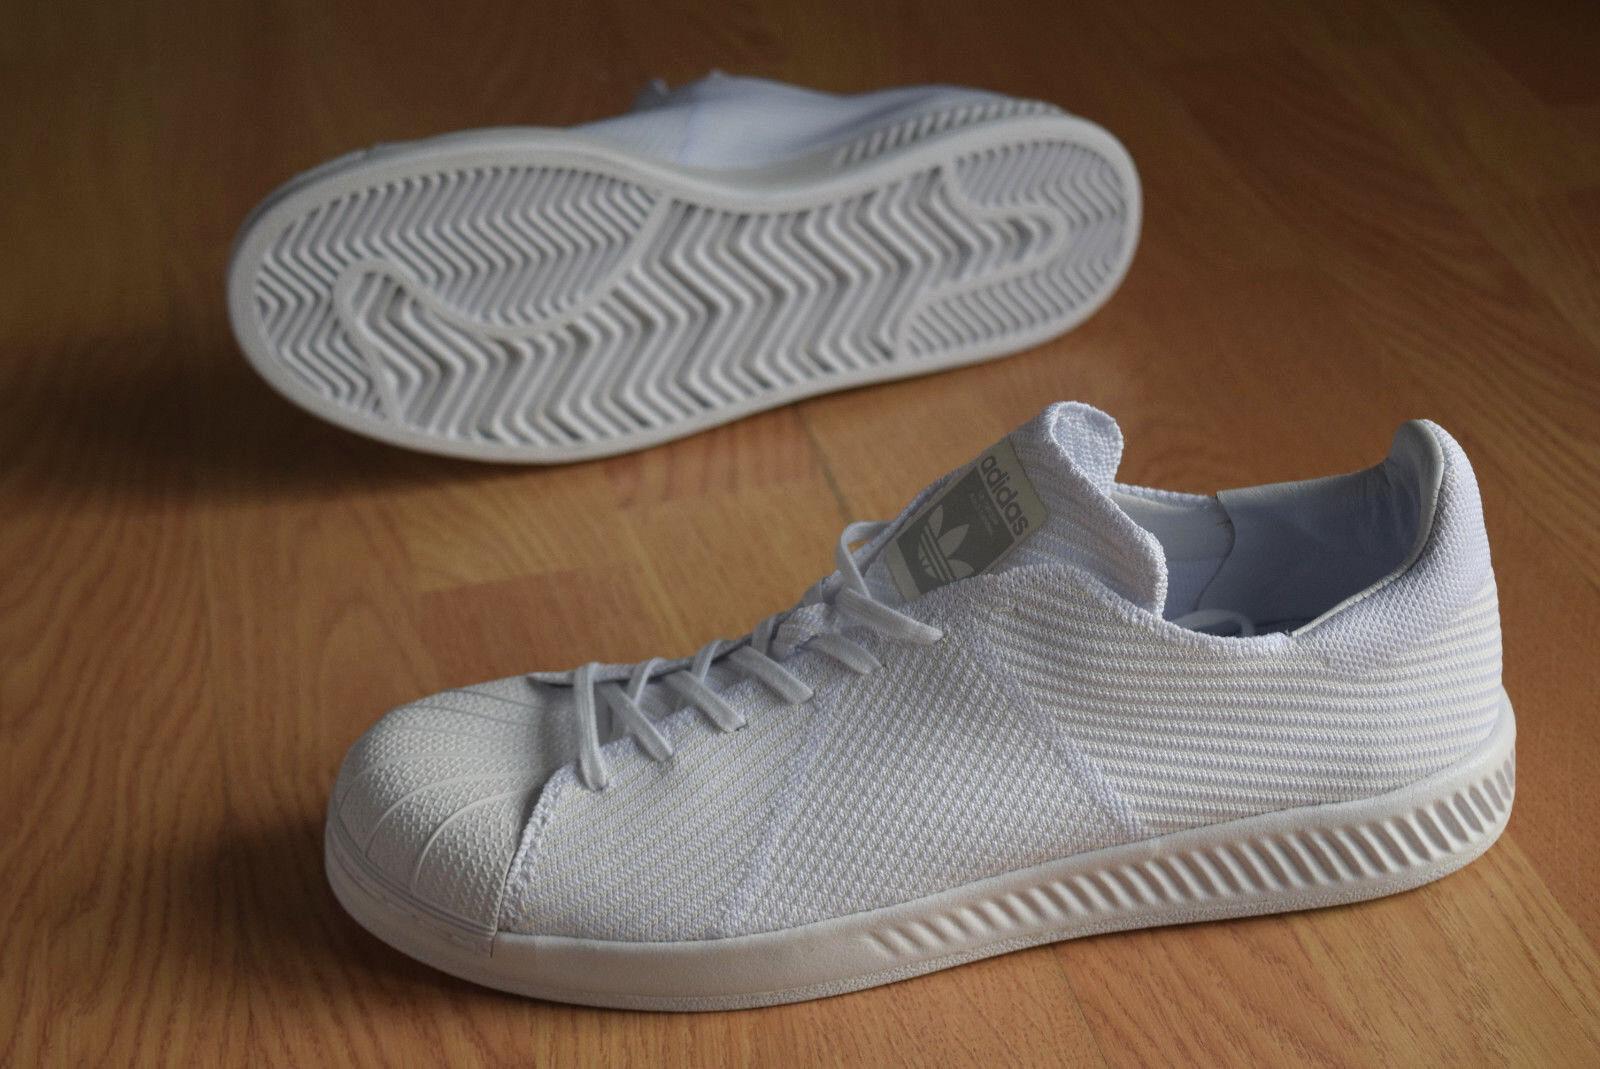 adidas Superstar Bounce PK 36,5 38,5 40 42 43 44 45 47 stan smith campus S82240